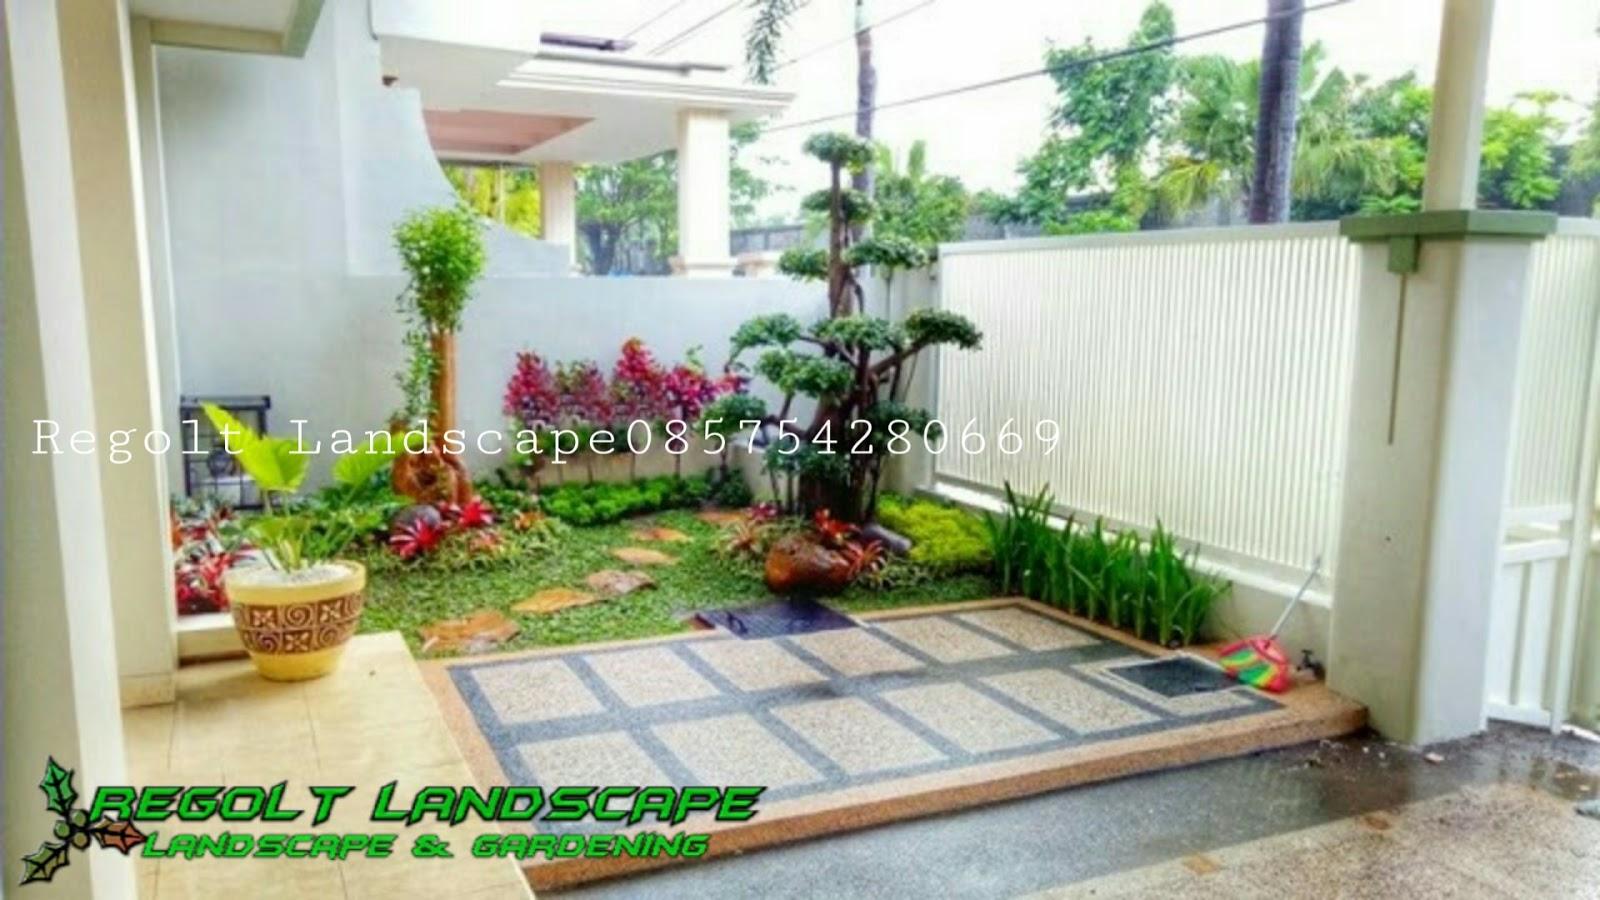 Jasa Tukang Taman Surabaya | Tukang Taman Surabaya